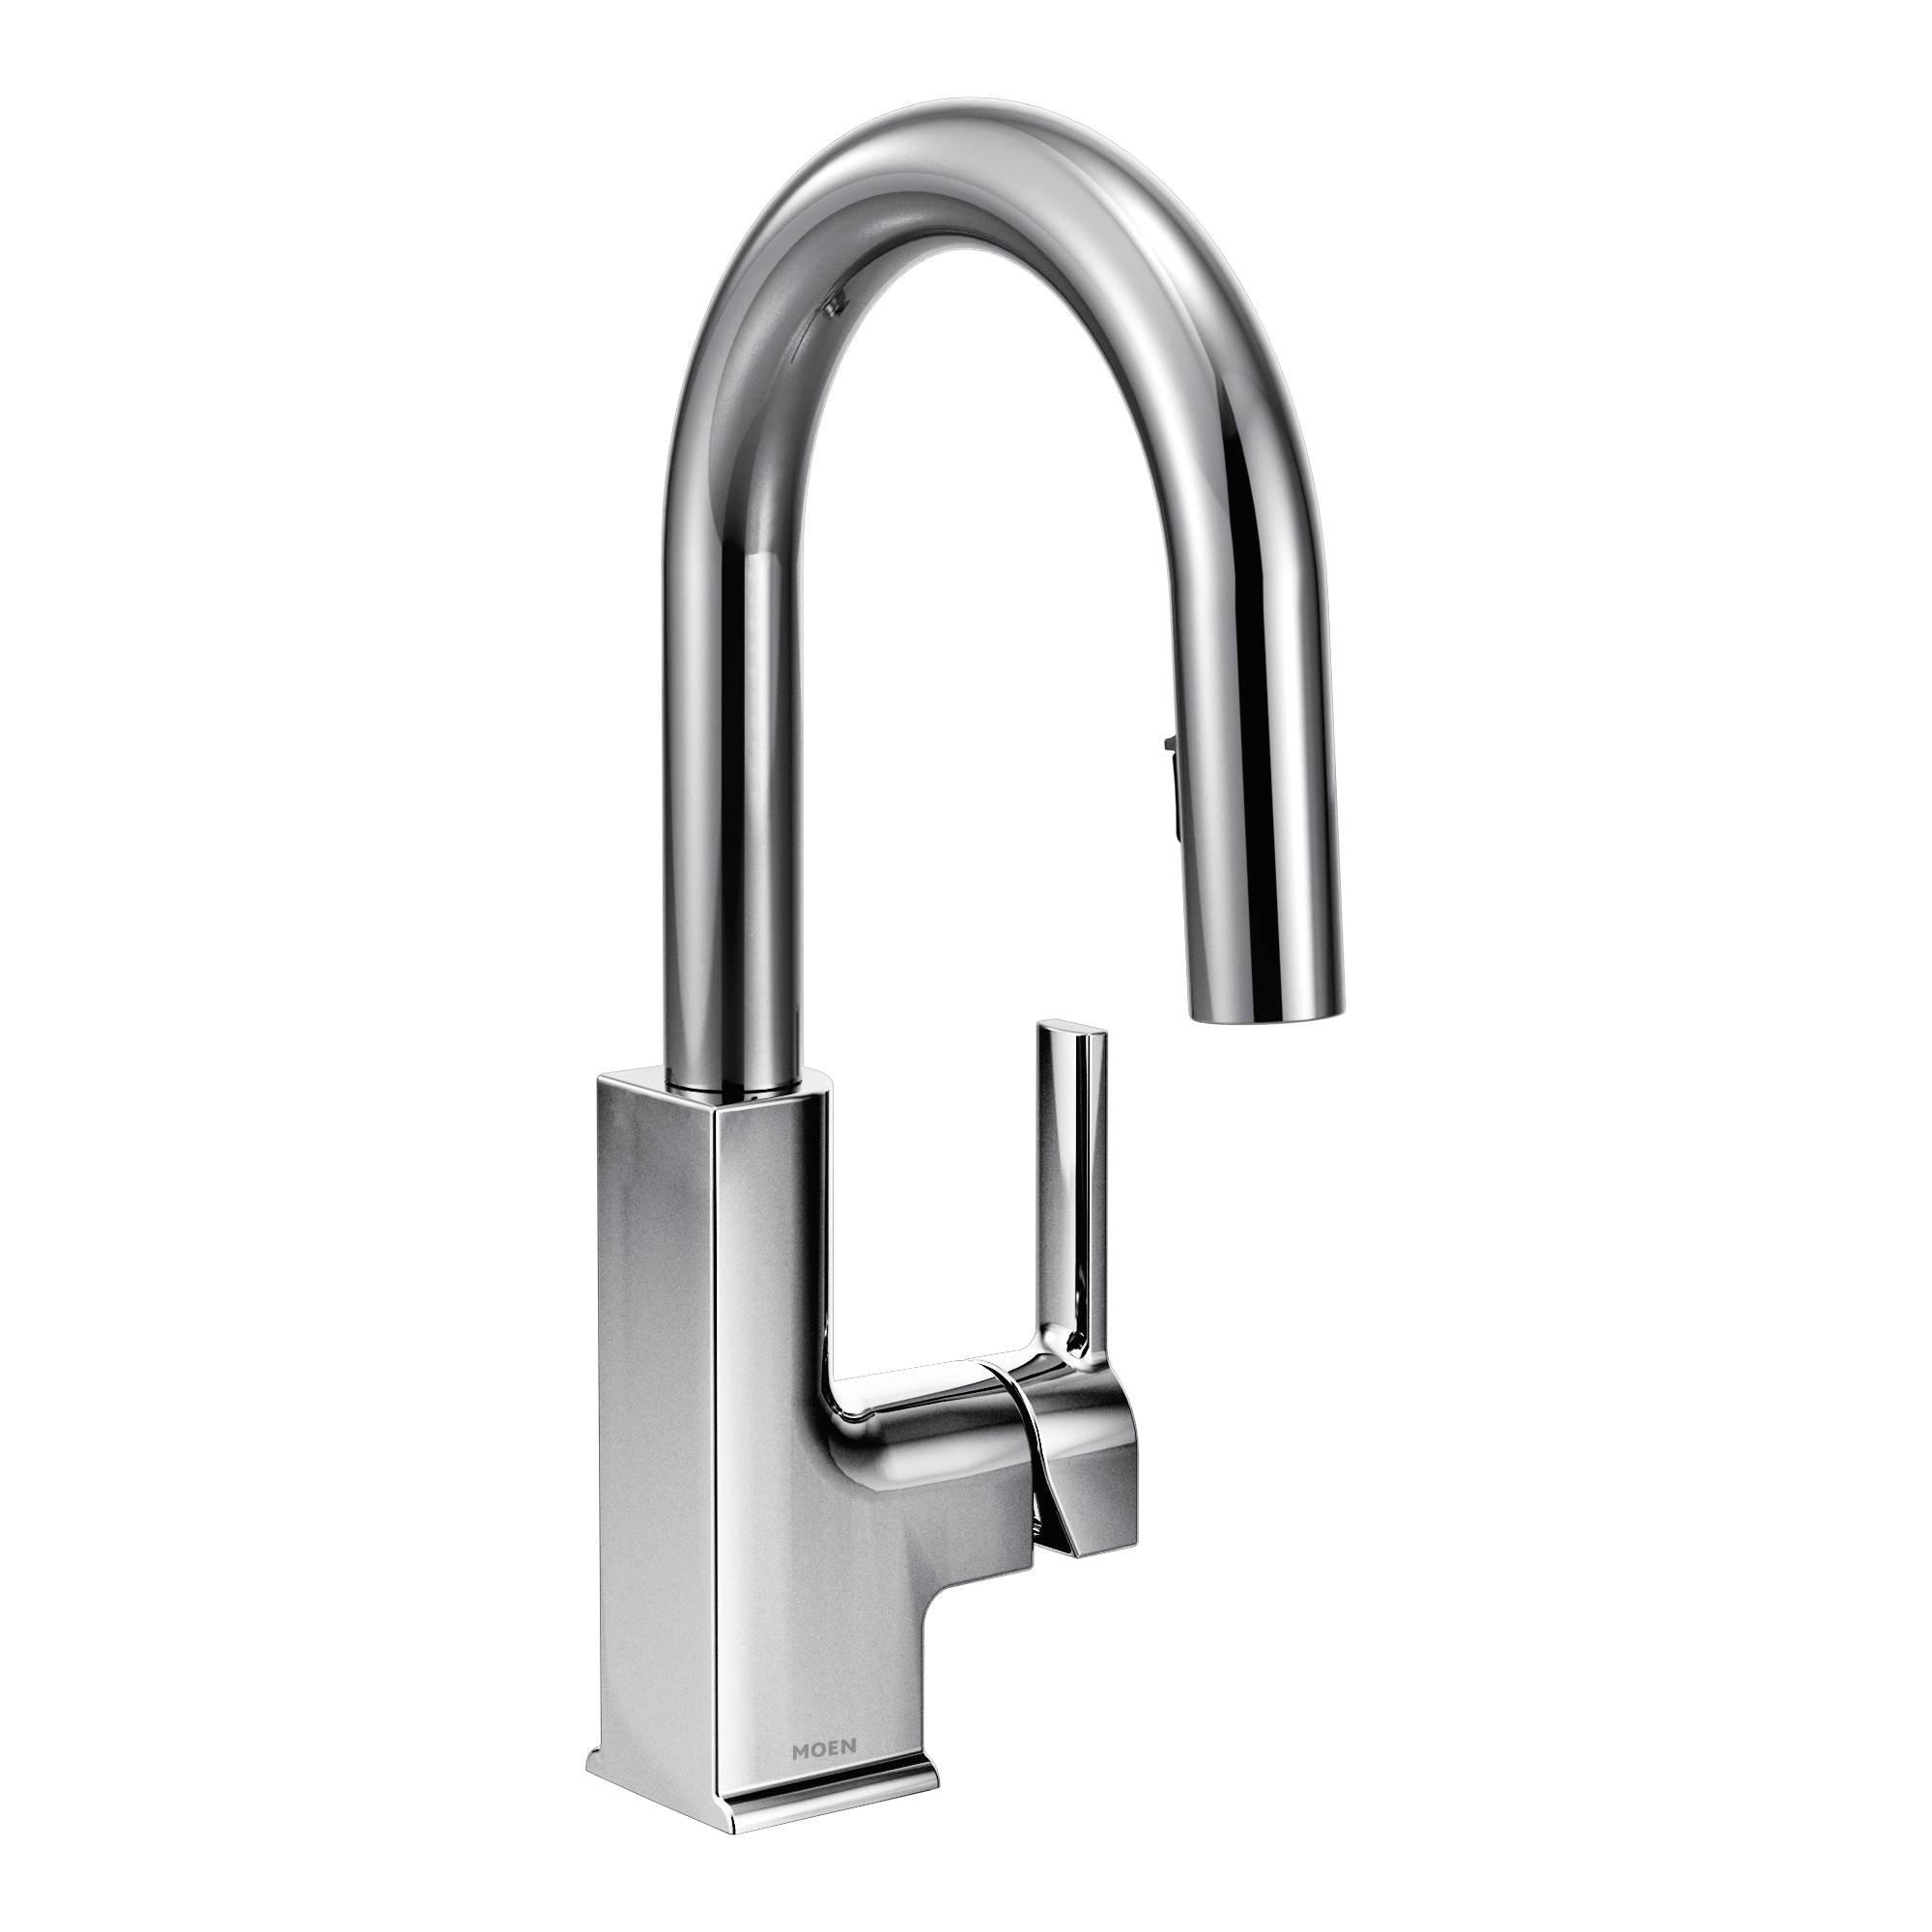 Moen S62308 STO One-Handle High Arc Pulldown Bar Faucet Featuring Reflex, Chrome